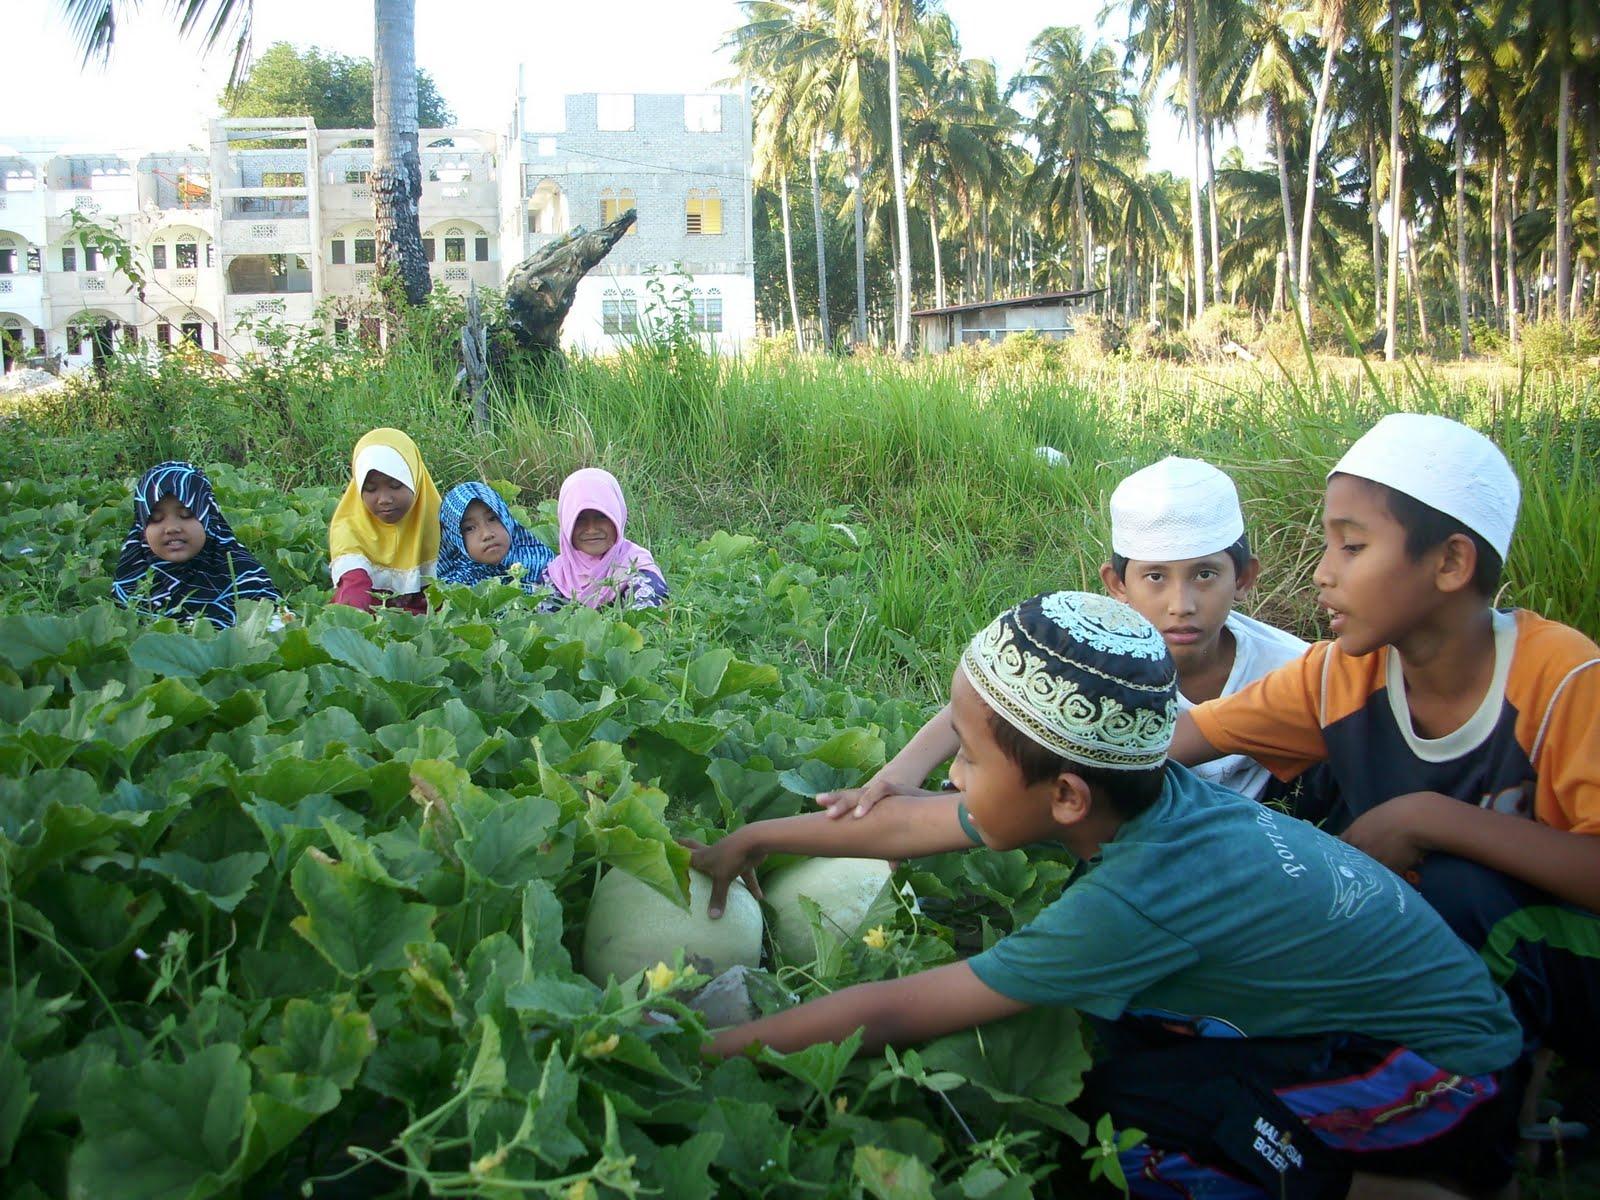 Rumah Anakanak Yatim Salimah Aktiviti Ekonomi